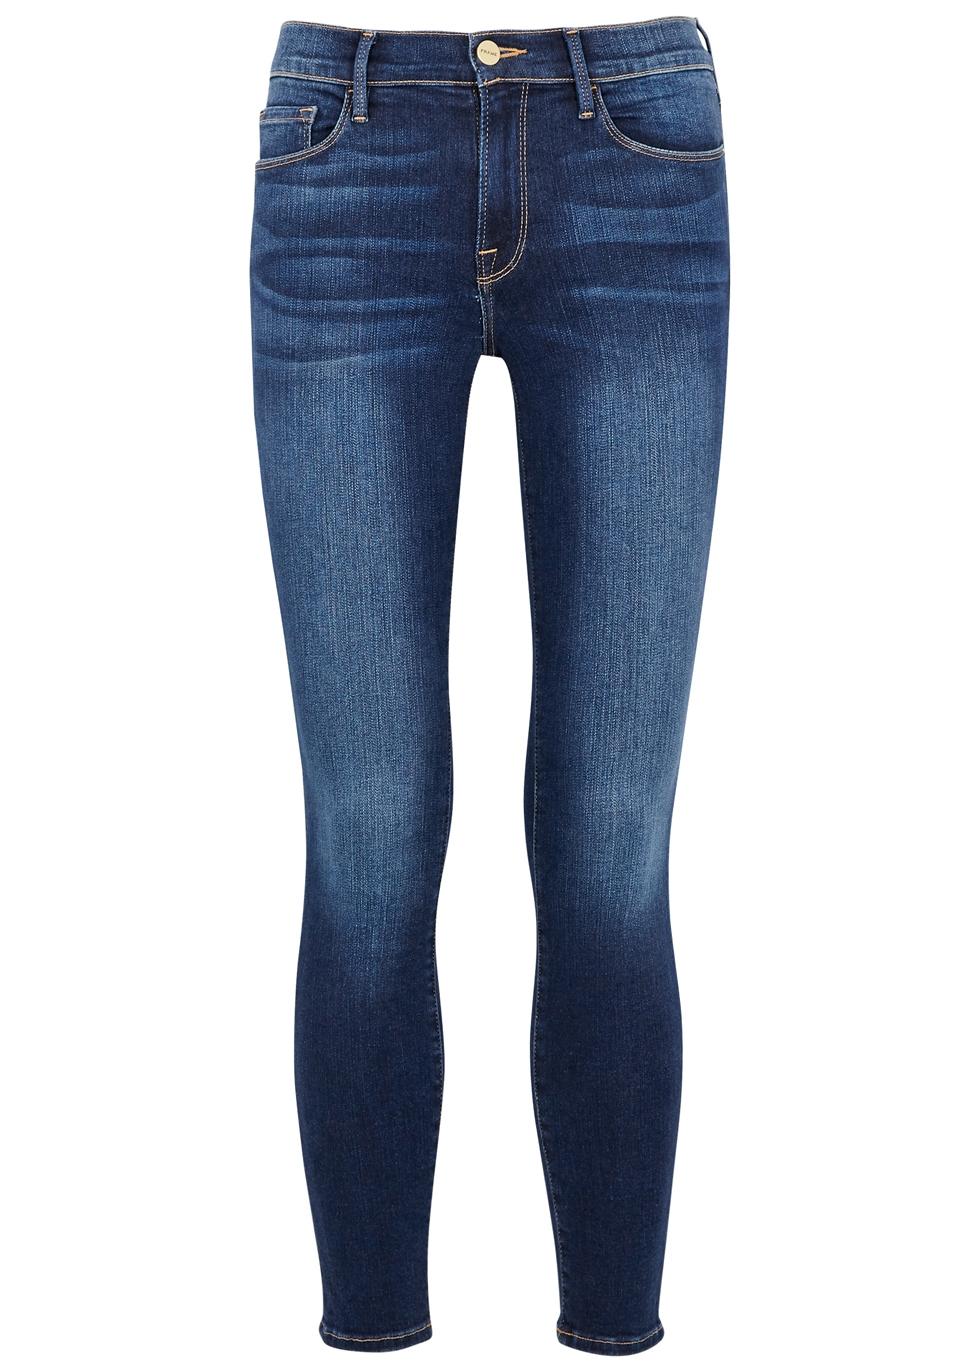 Jeans Denim Blue Nichols Jeanne Skinny De Crop Frame Le Dark Harvey PqUSFf